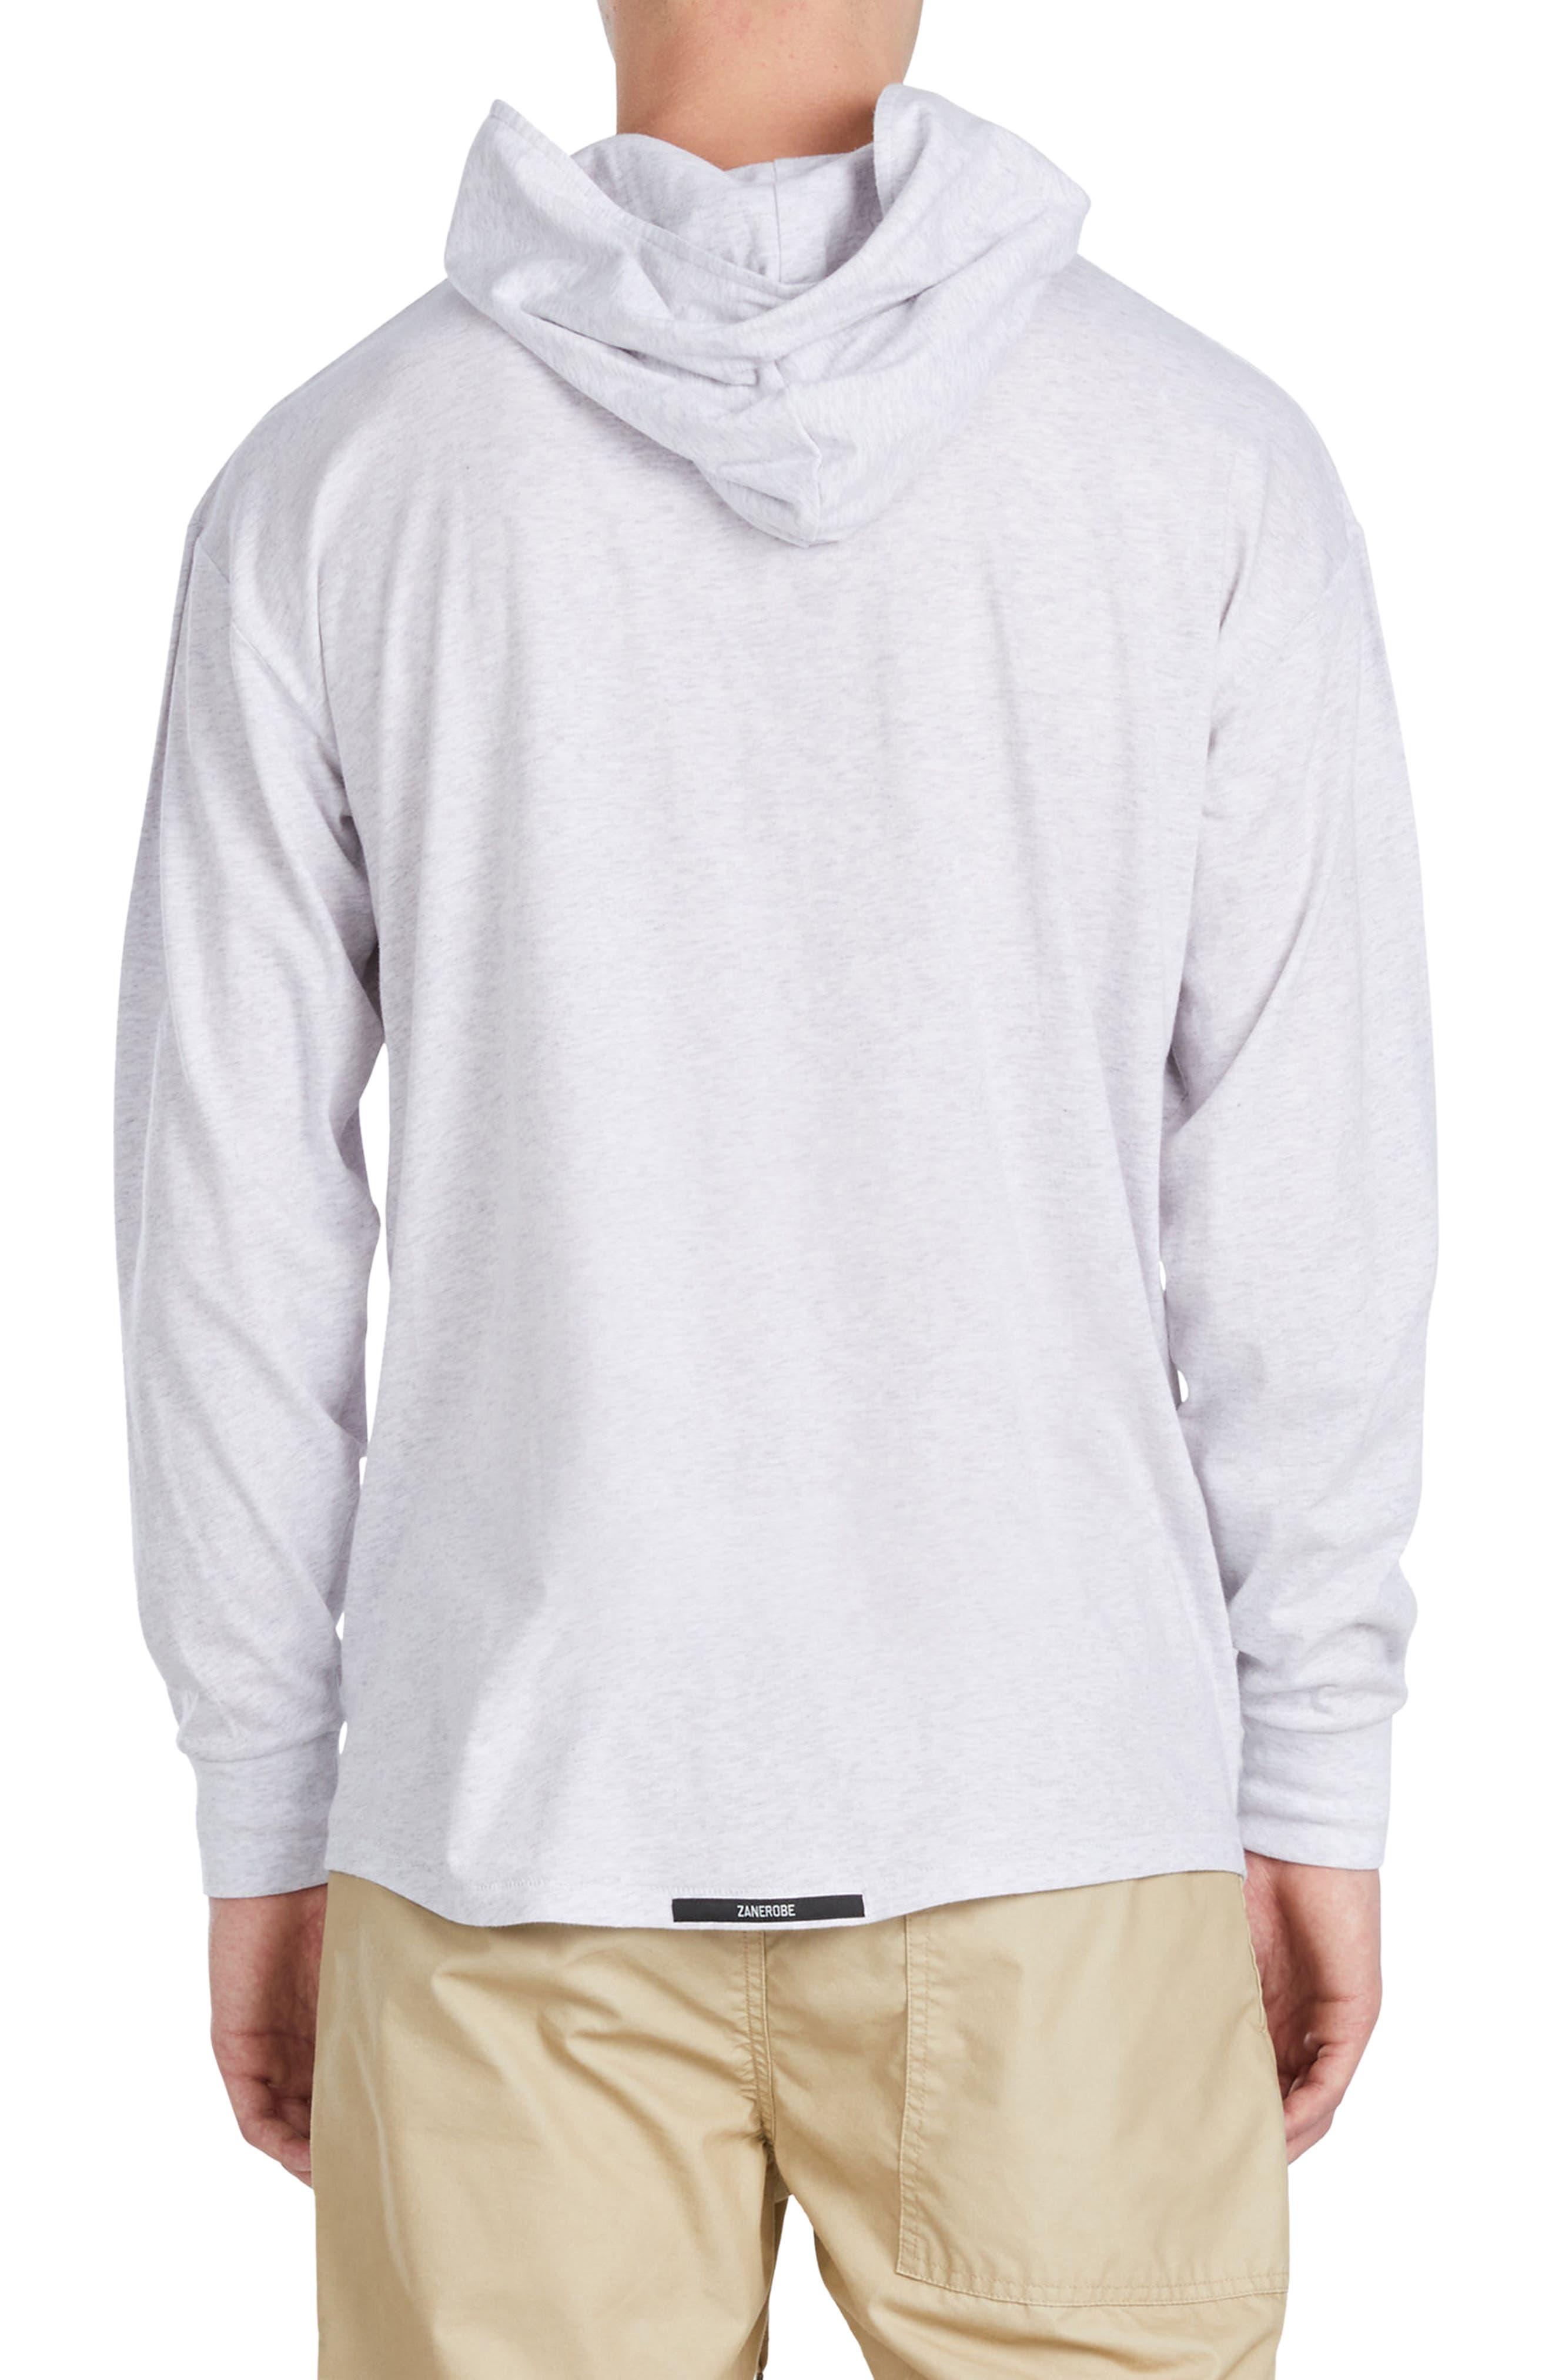 Rugger Long Sleeve Hooded T-Shirt,                             Alternate thumbnail 2, color,                             Bleach Marled